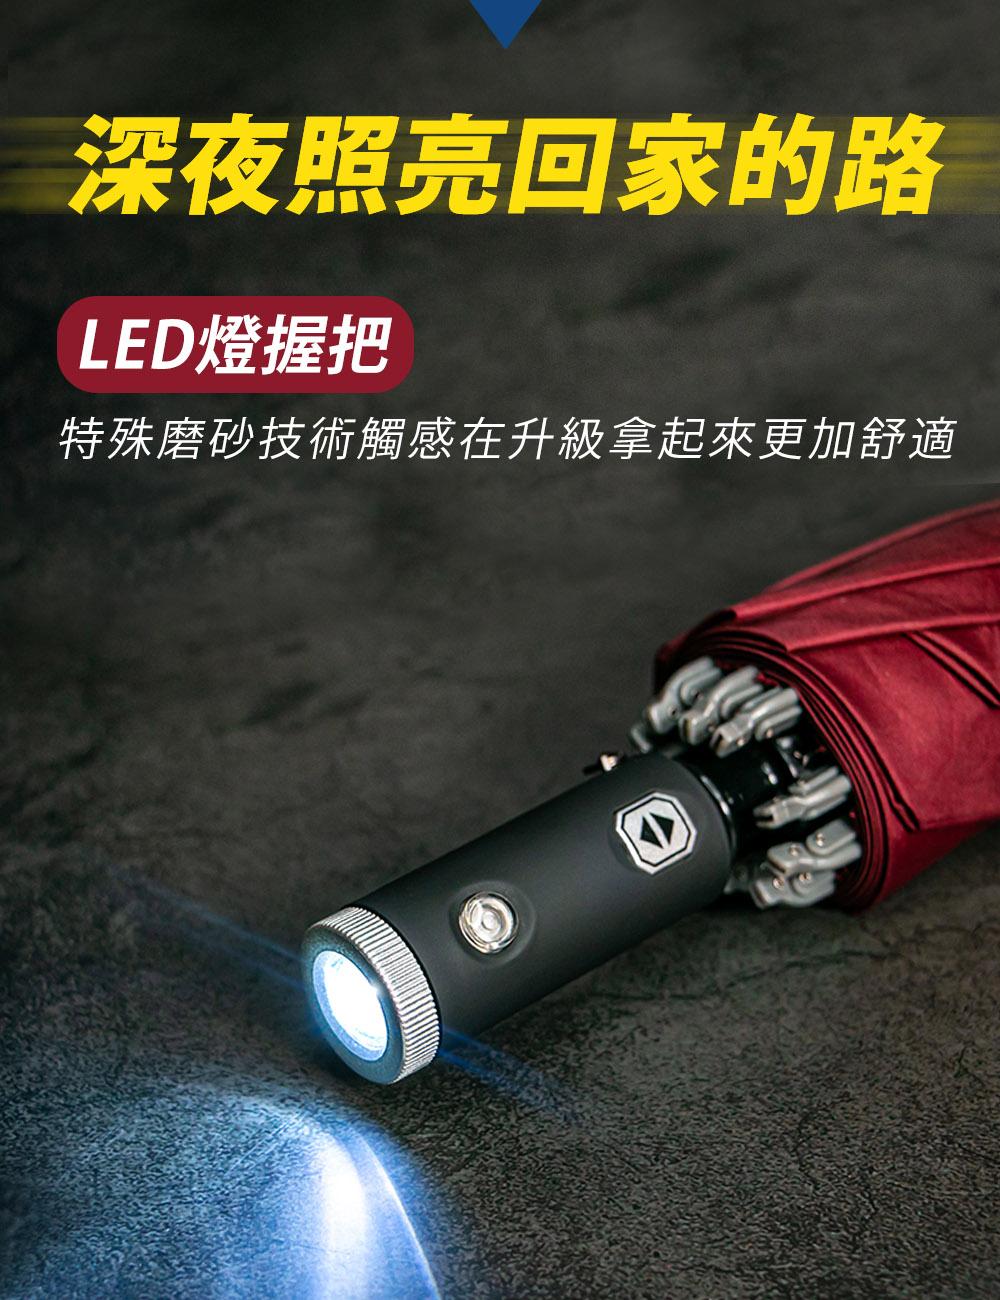 LED燈傘握把